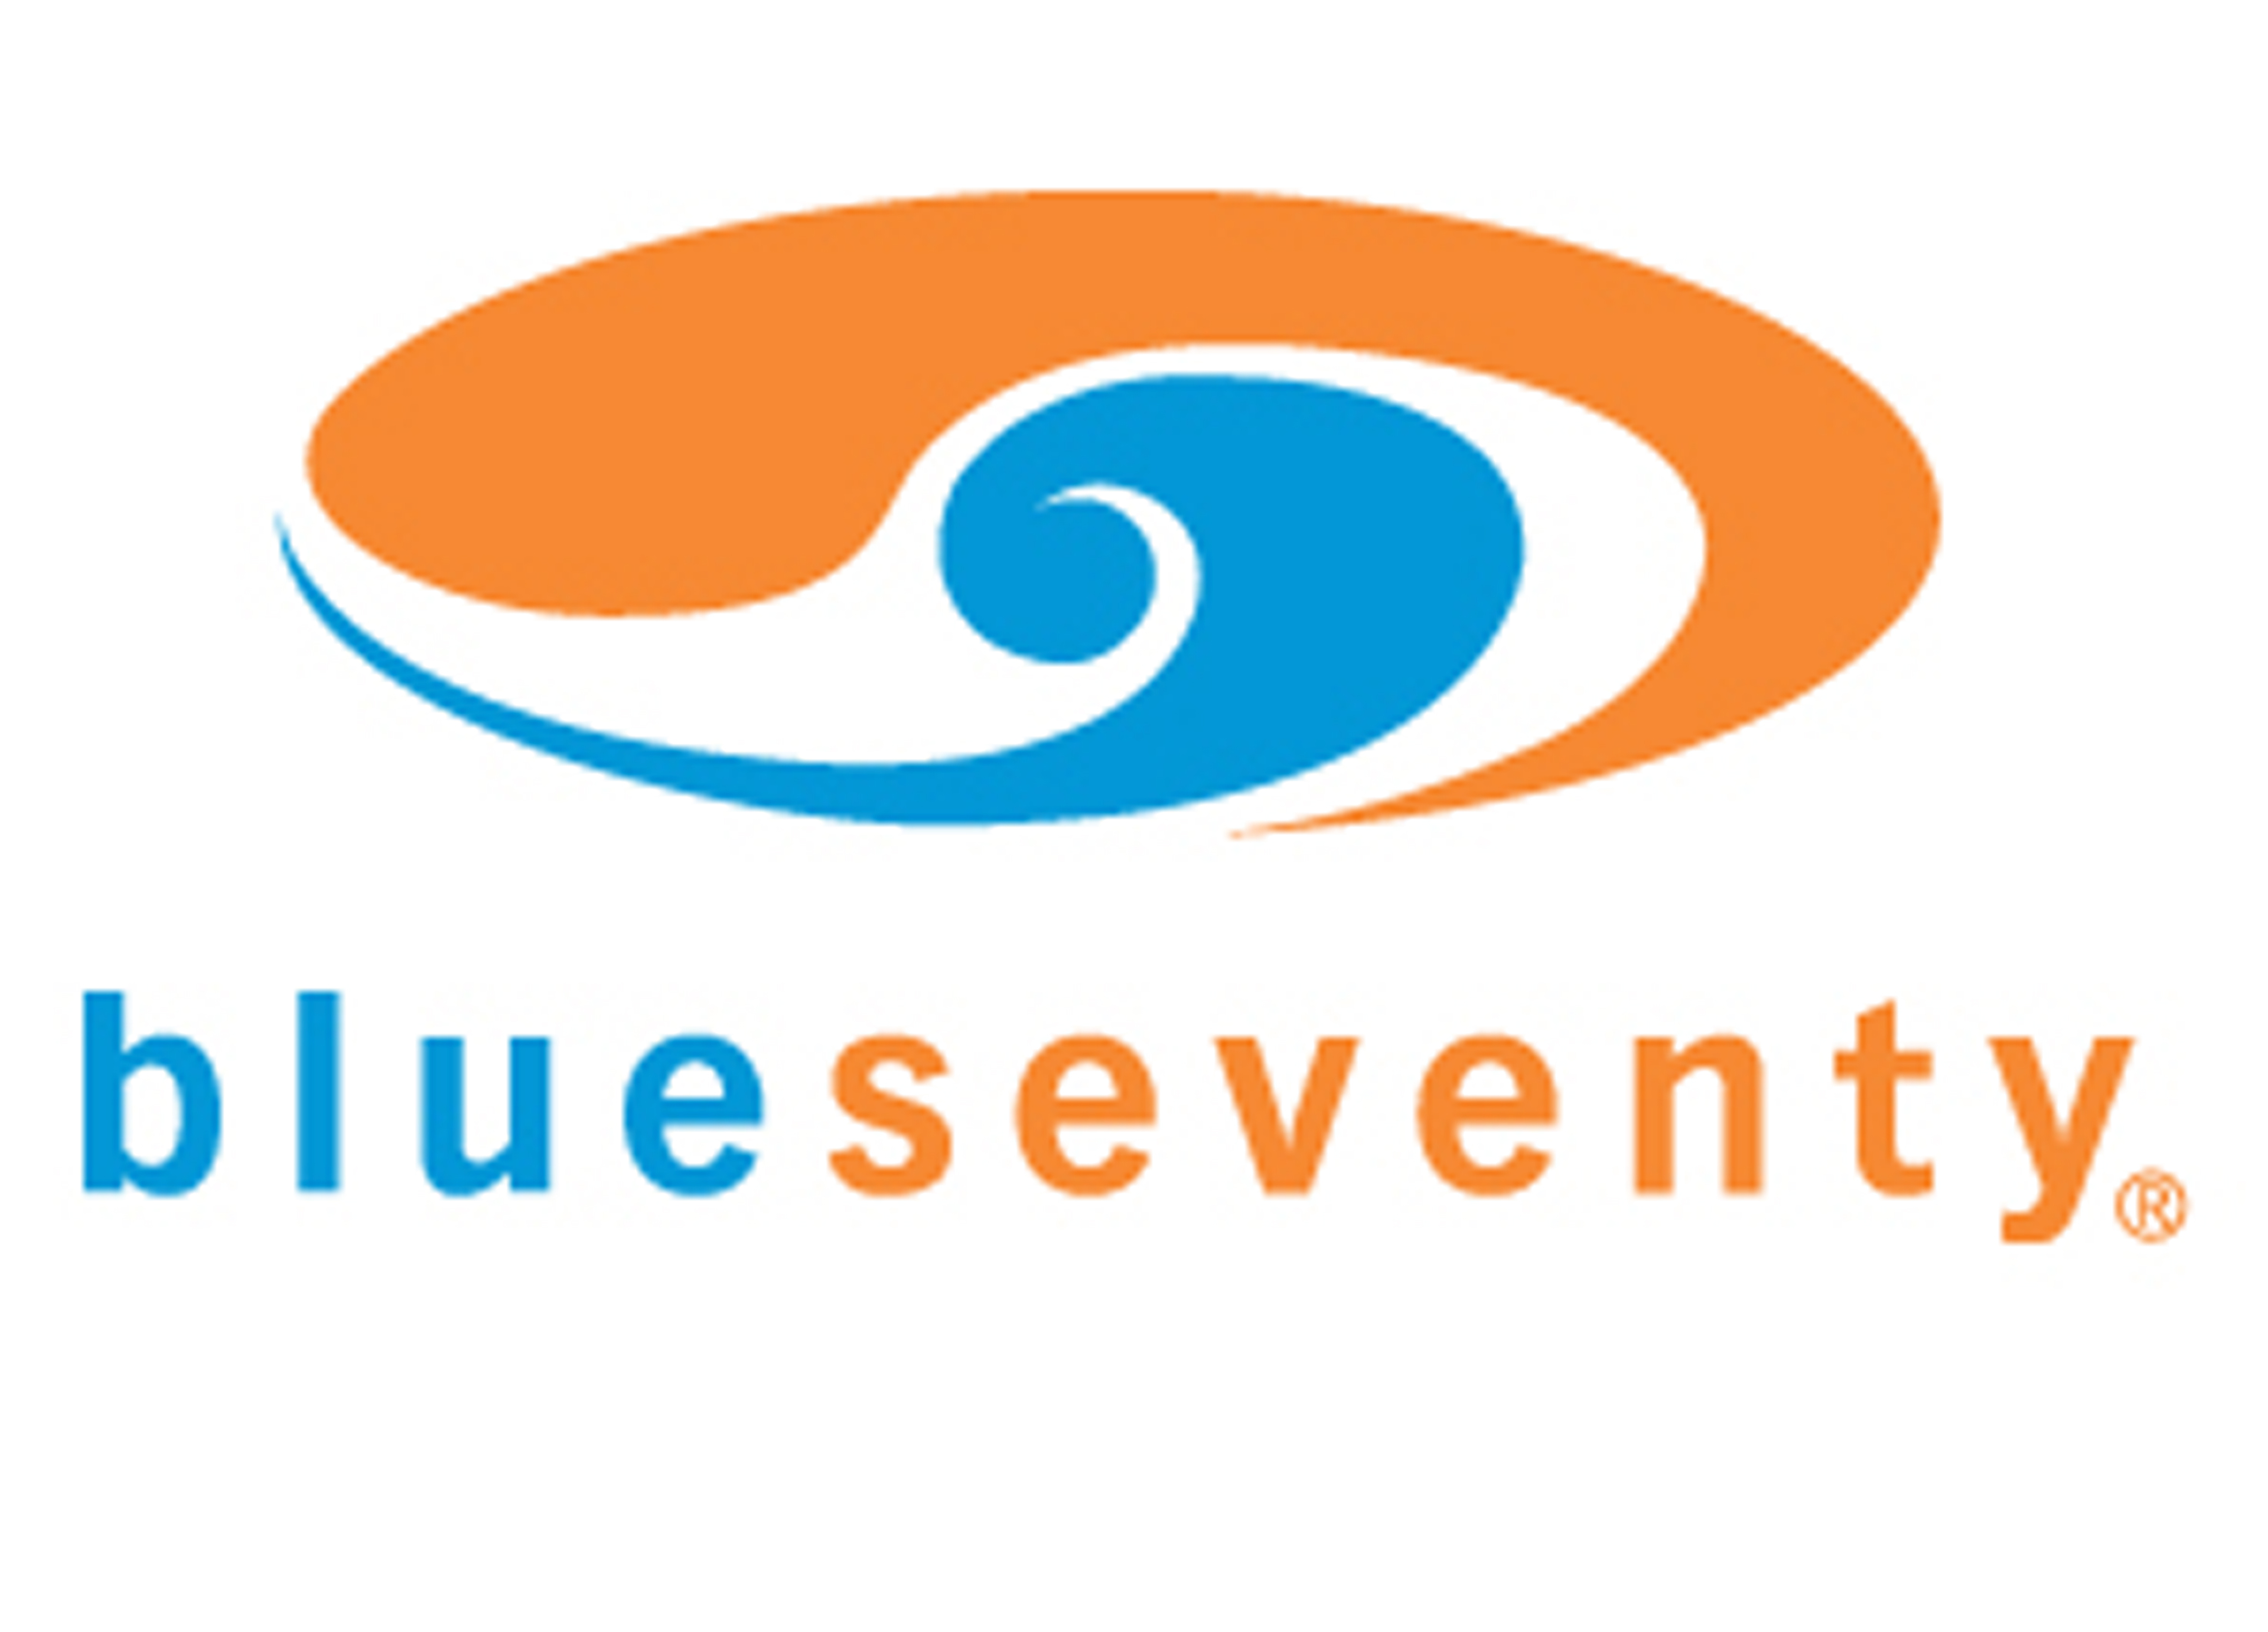 blueseventy.com